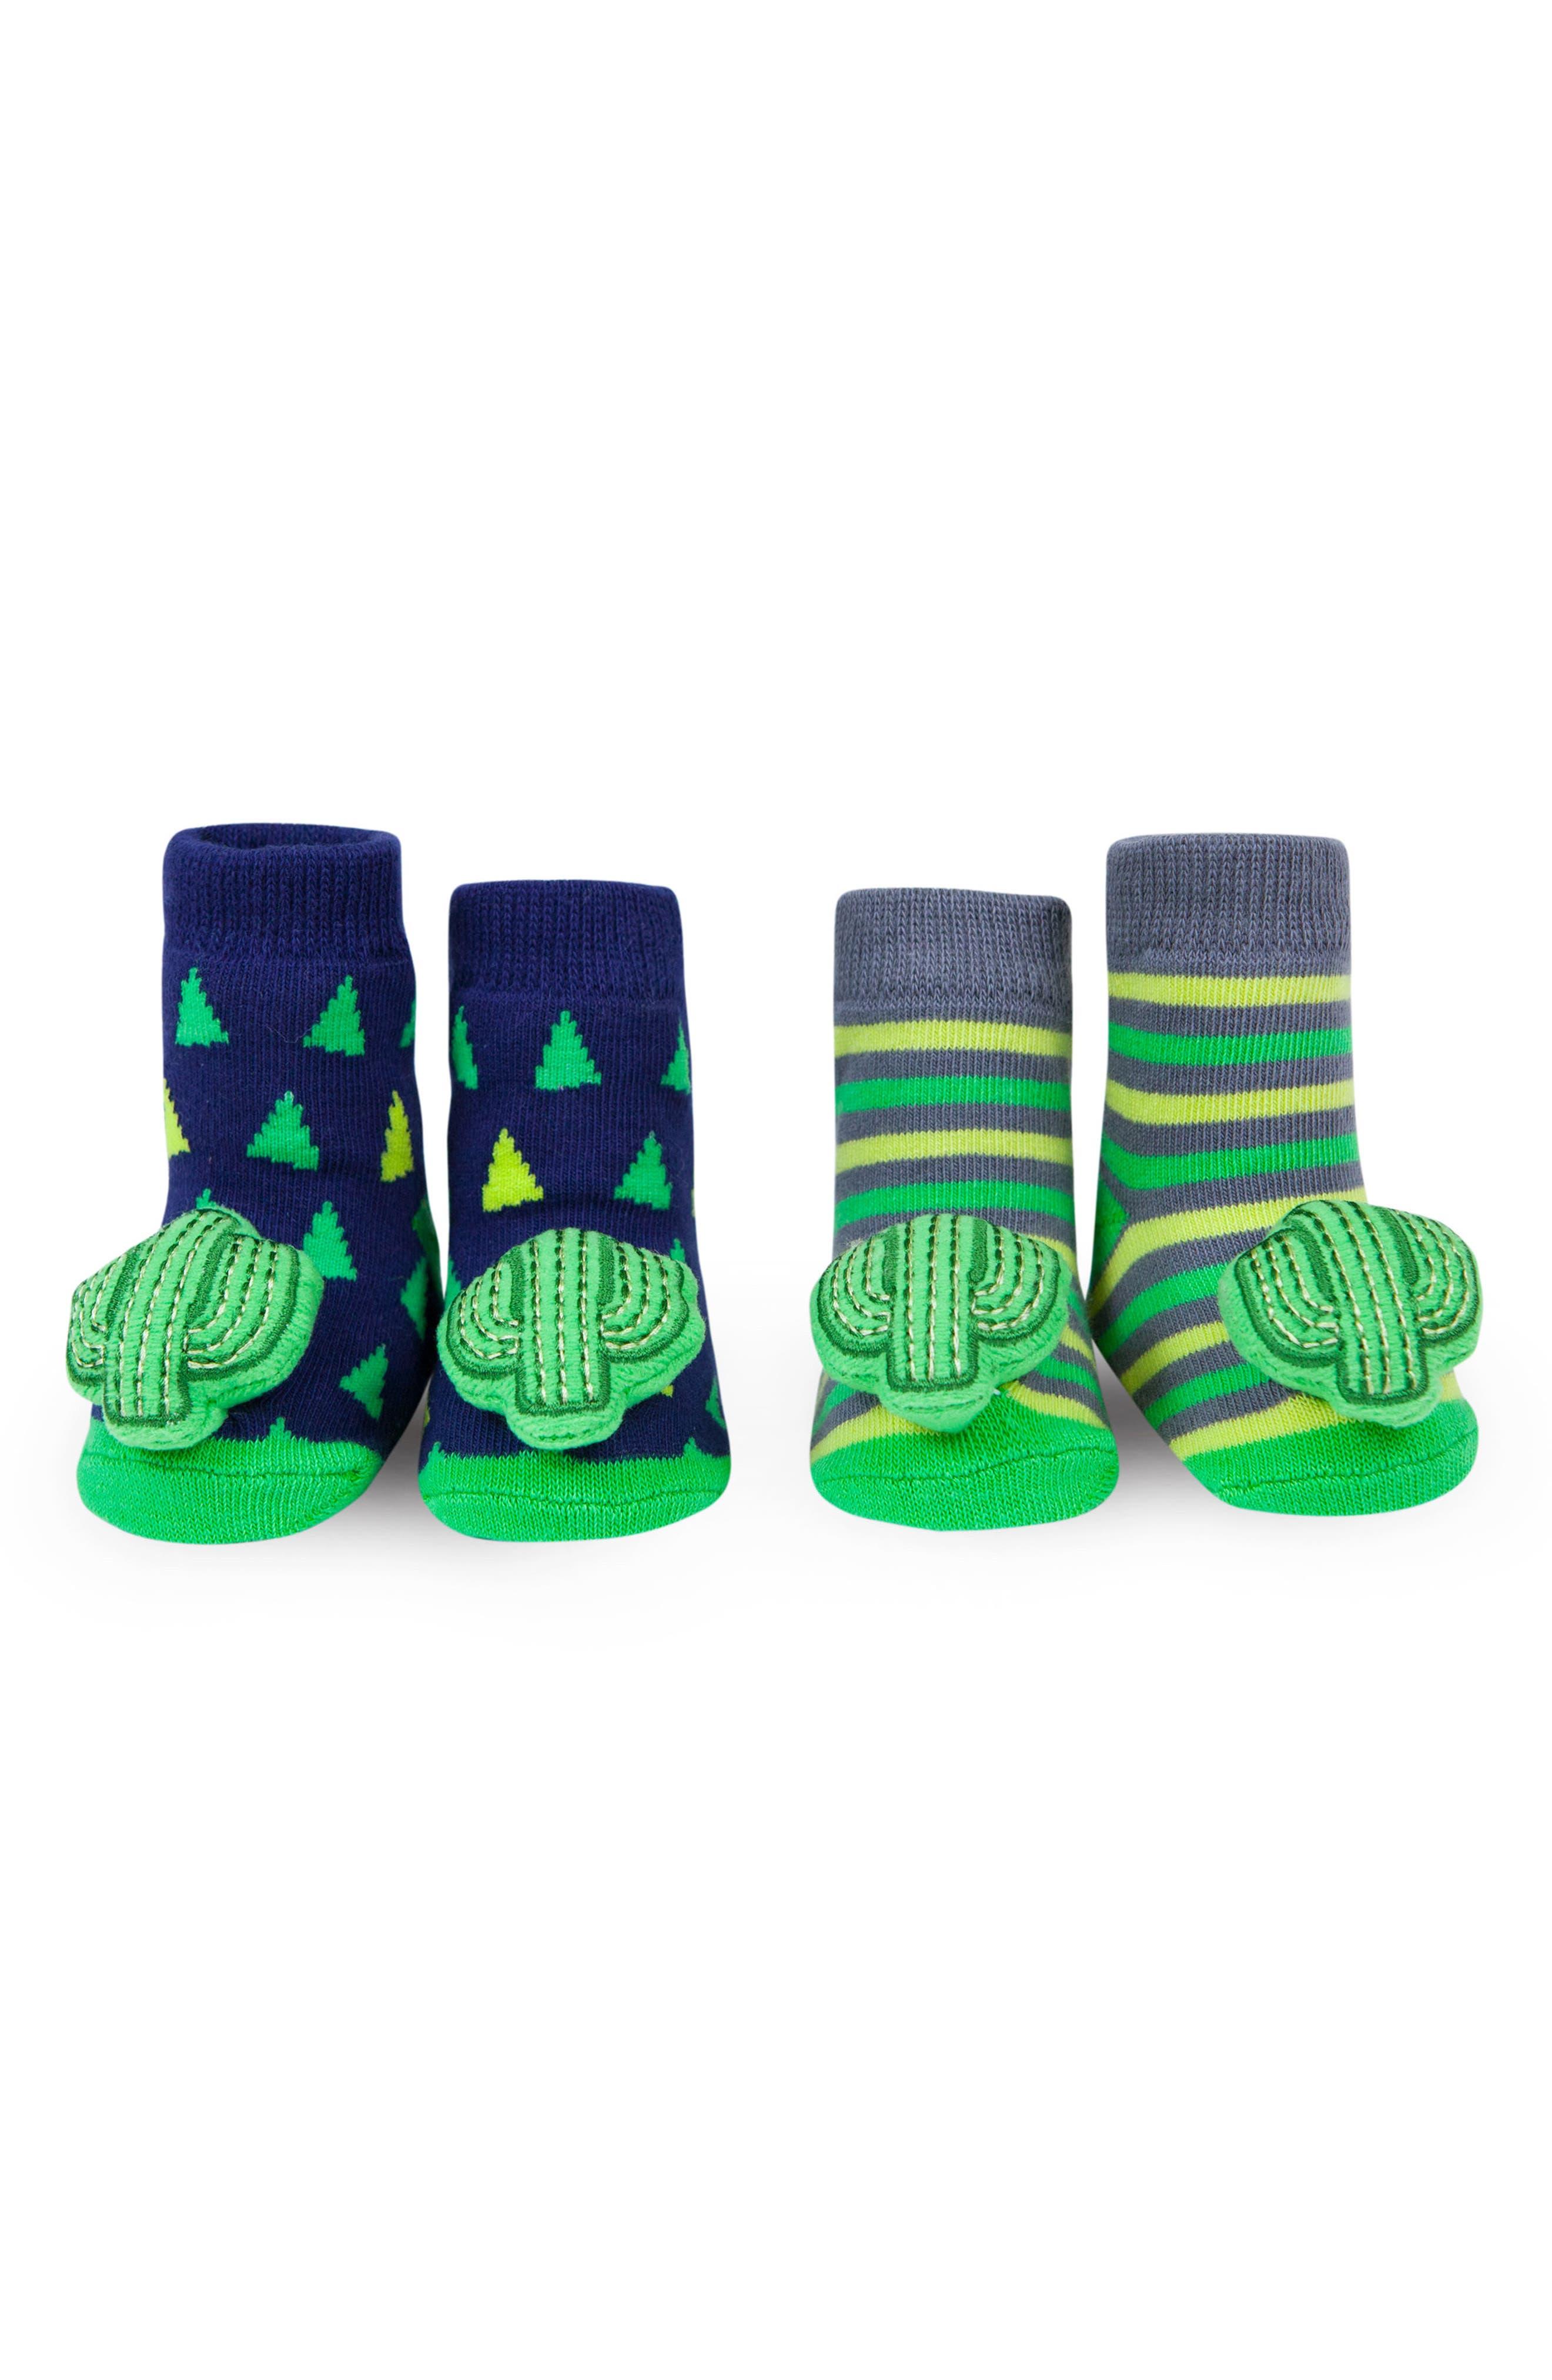 Cactus 2-Pack Rattle Socks,                             Main thumbnail 1, color,                             Blue/ Green